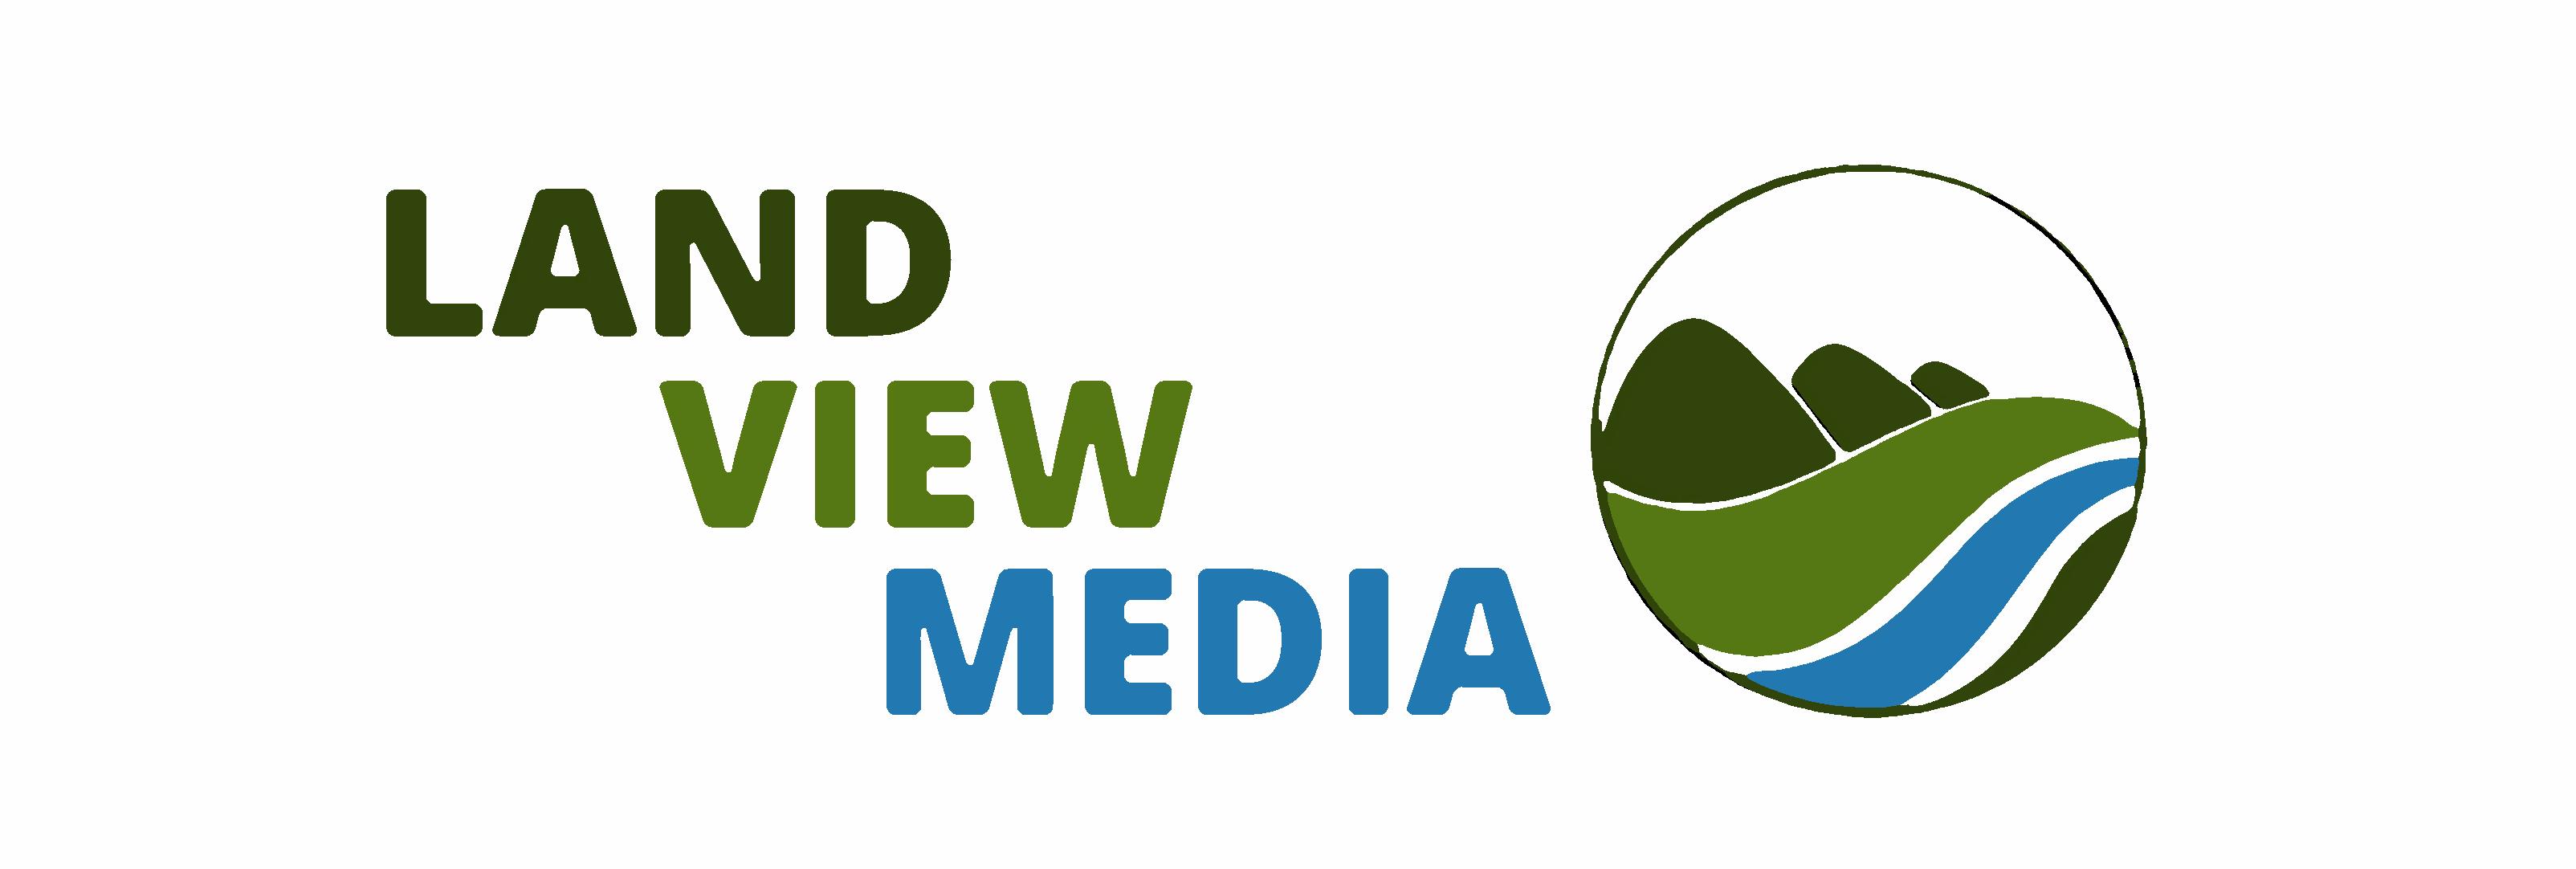 Land View Media